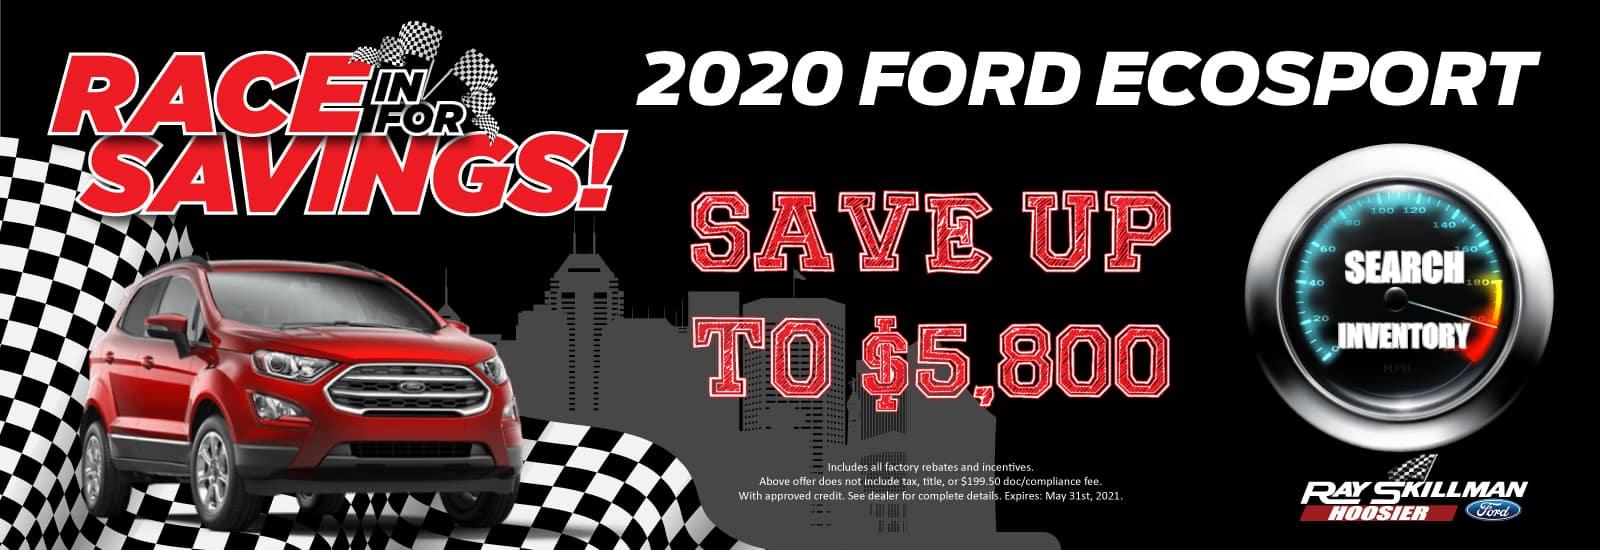 HoosierMAY2020-Ford-Ecosport-Web-Banner-1600×550